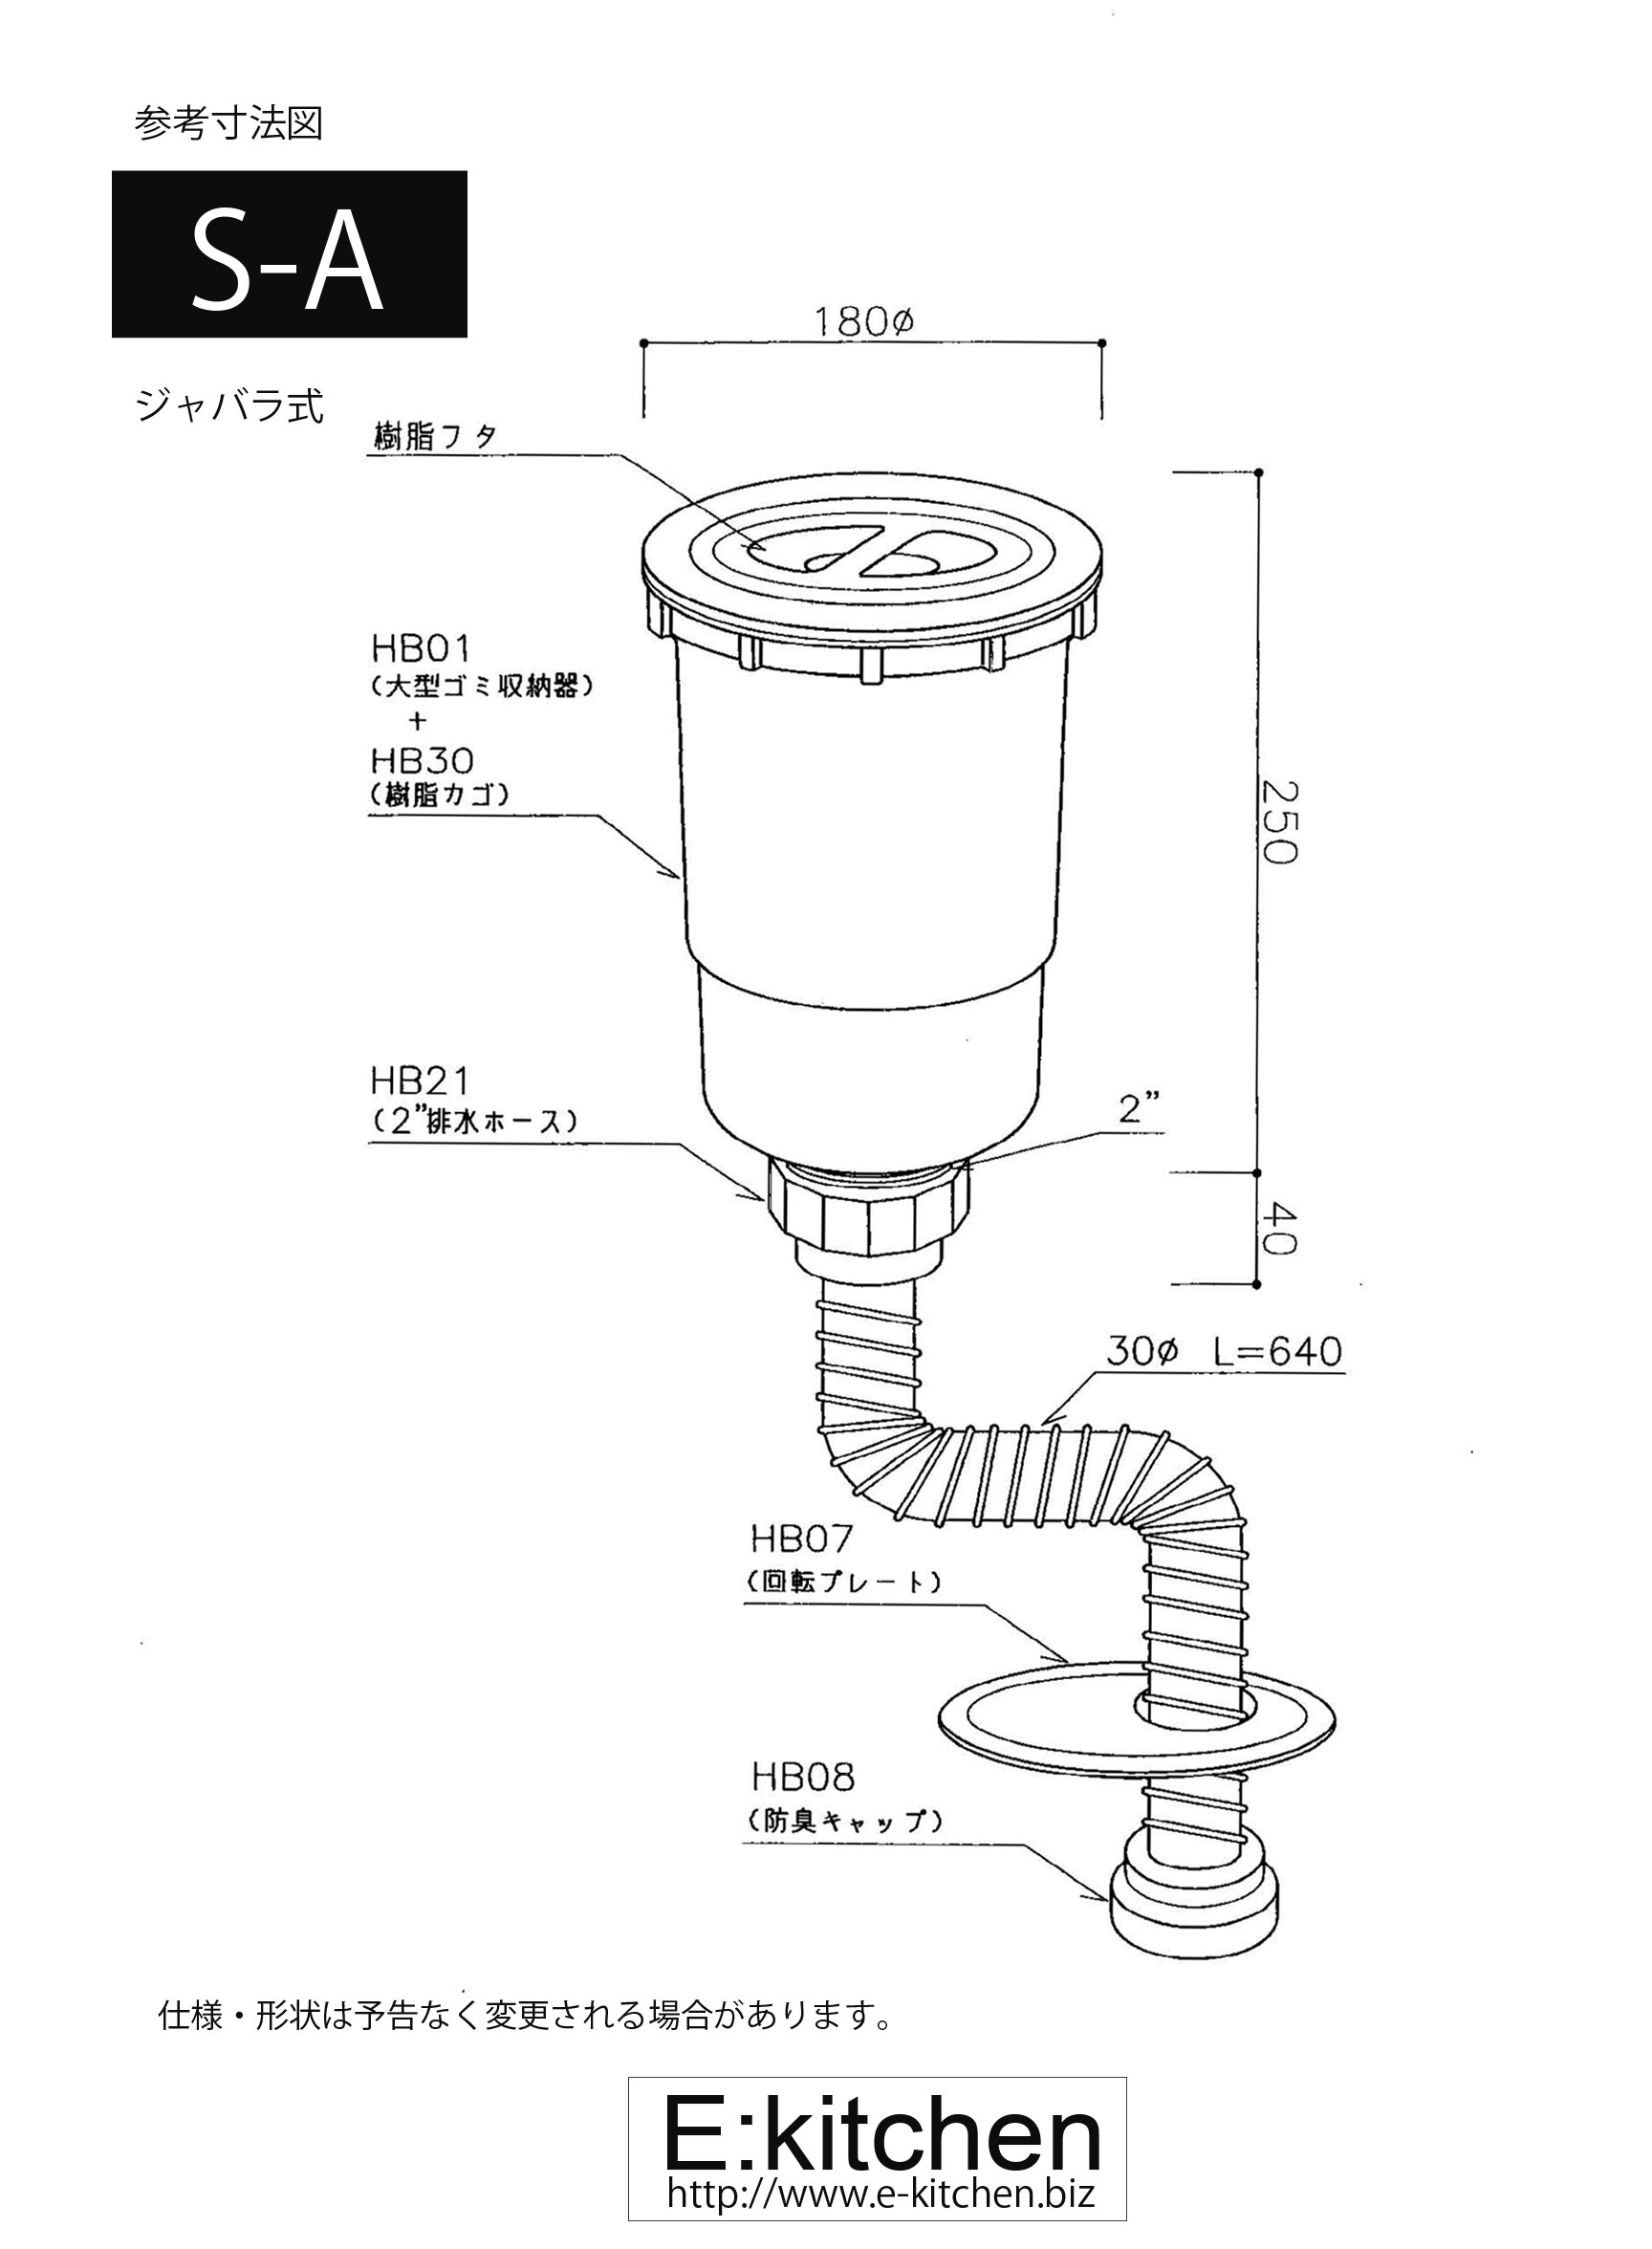 CKシリーズ 排水部品S-A